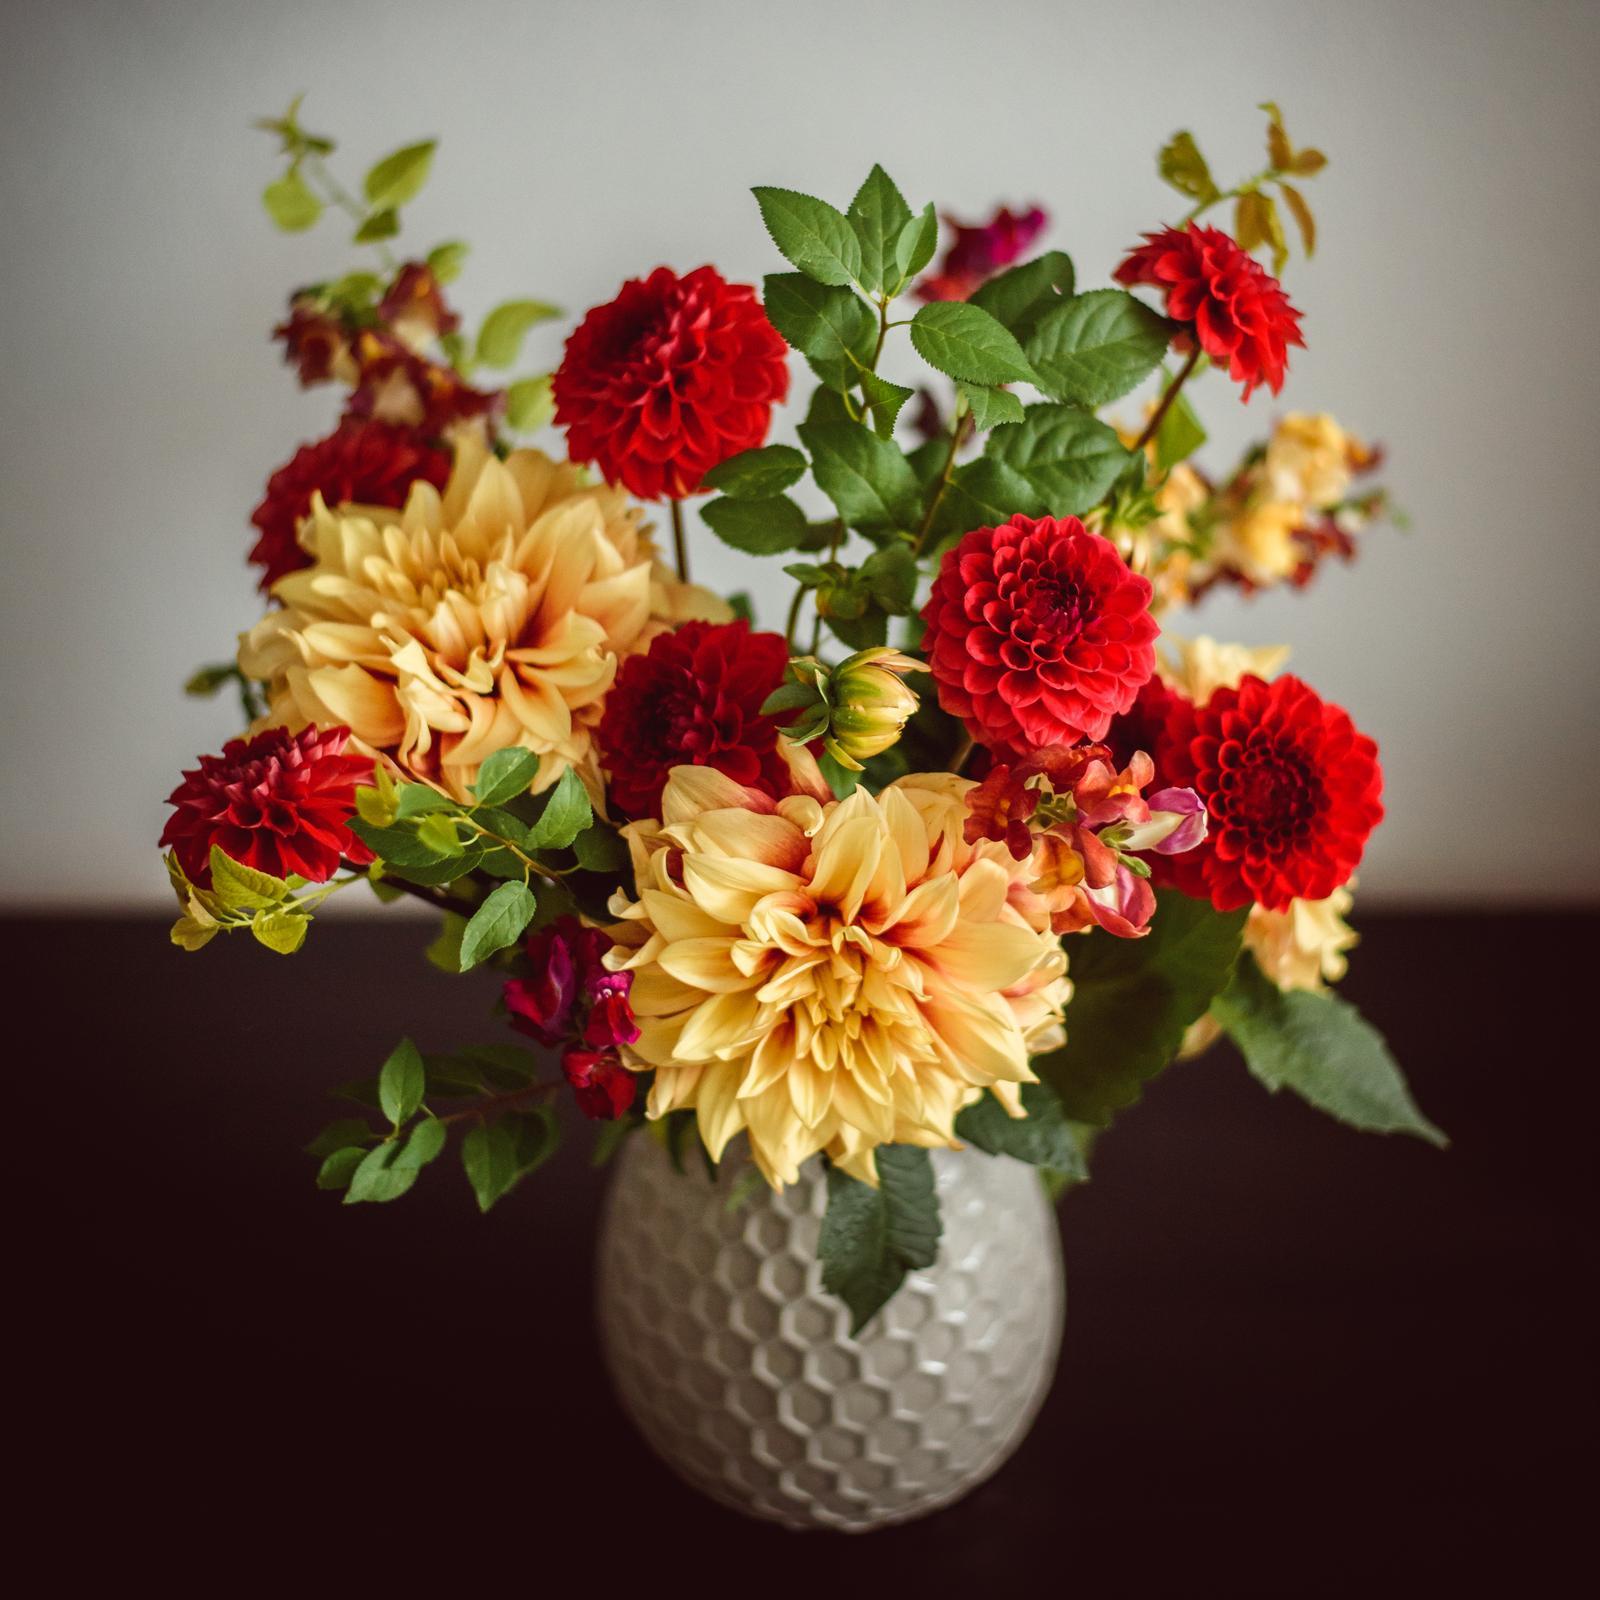 Moje kvetinové aranžmány - Dahlia Dazzling Magic + Red Cap, papulky a vyhonky z jablone